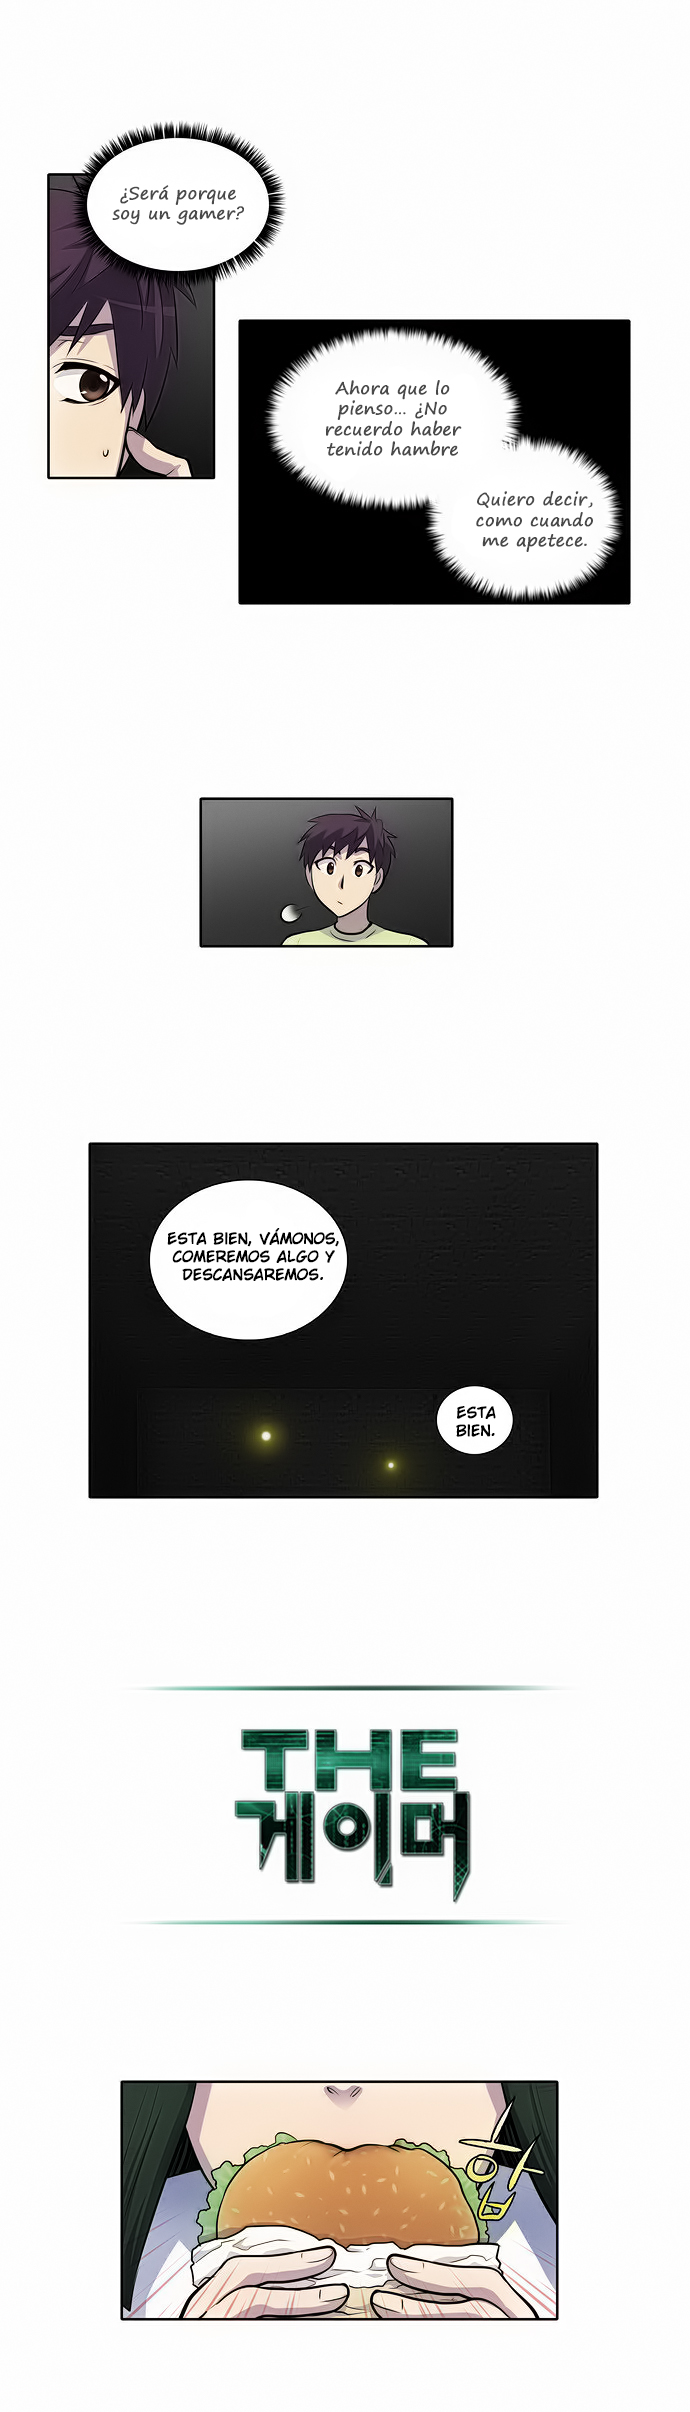 http://c5.ninemanga.com/es_manga/61/1725/434276/4ffd6130f73d7f56bbb4945039a91131.jpg Page 6